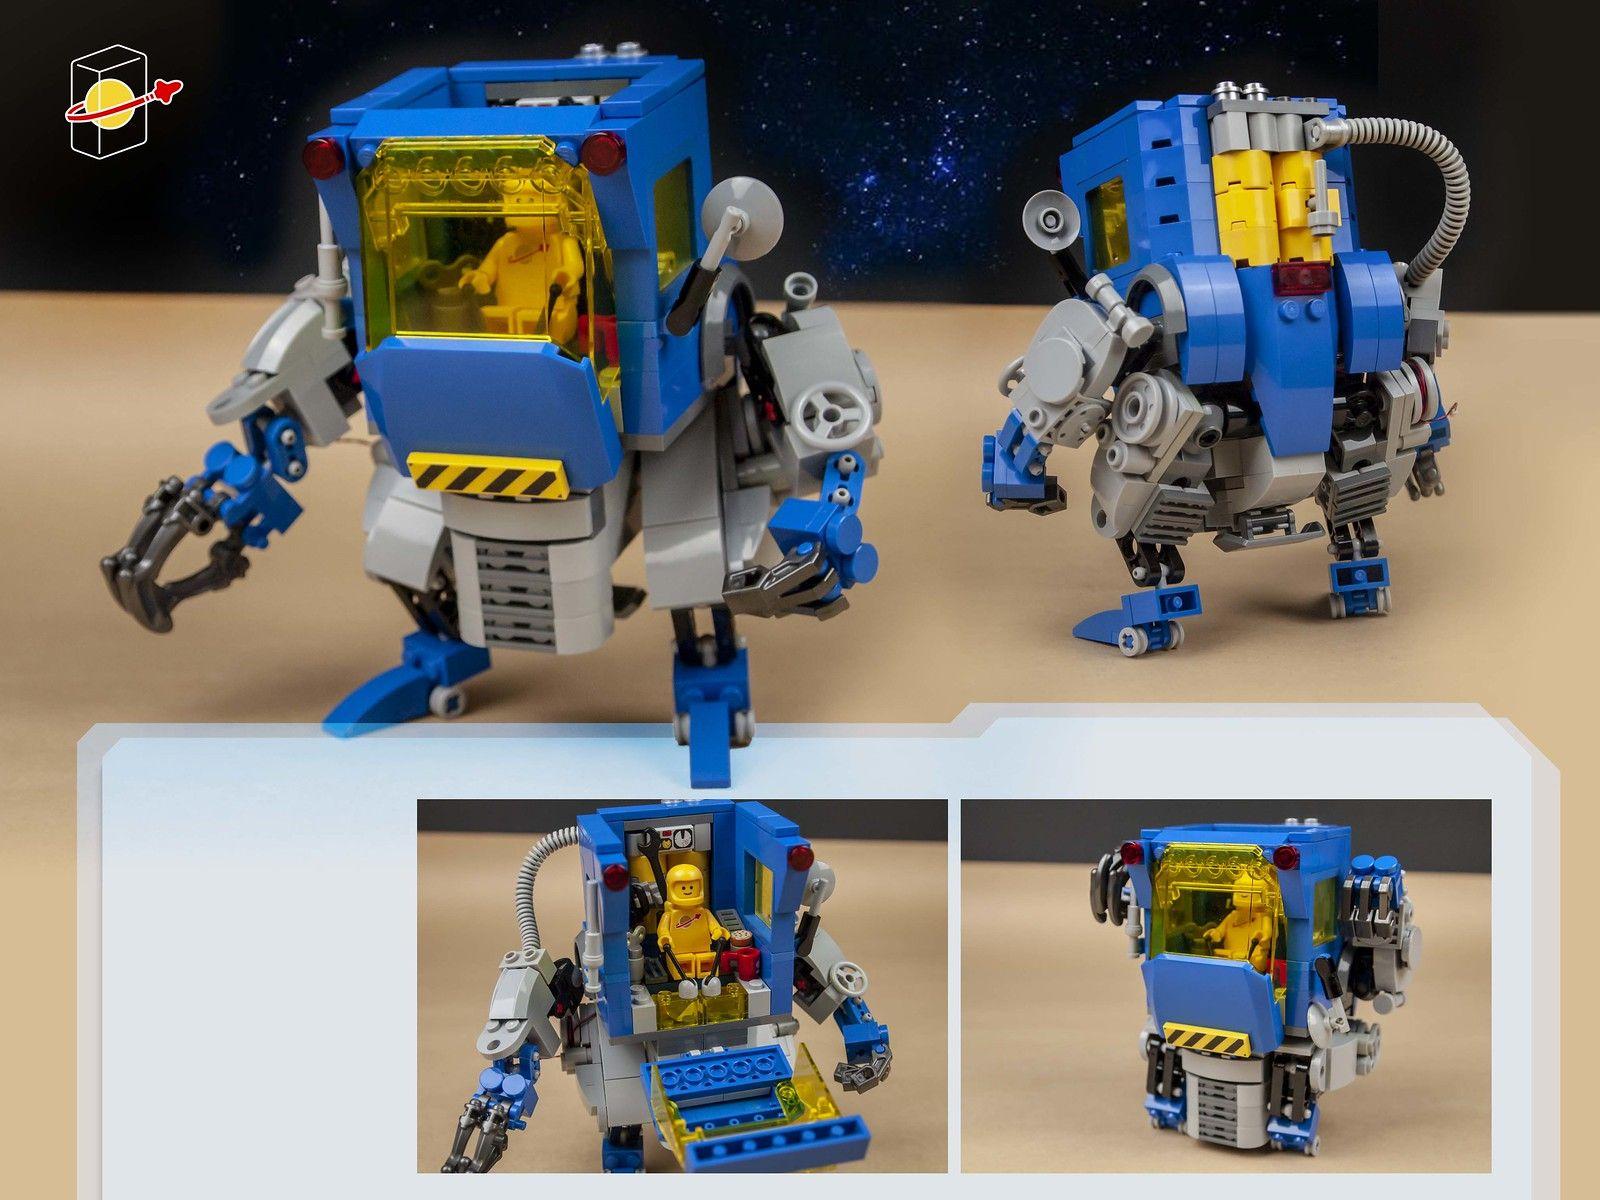 Lego Classic Space X Box Classic Lego Lego Custom Minifigures Classic Space